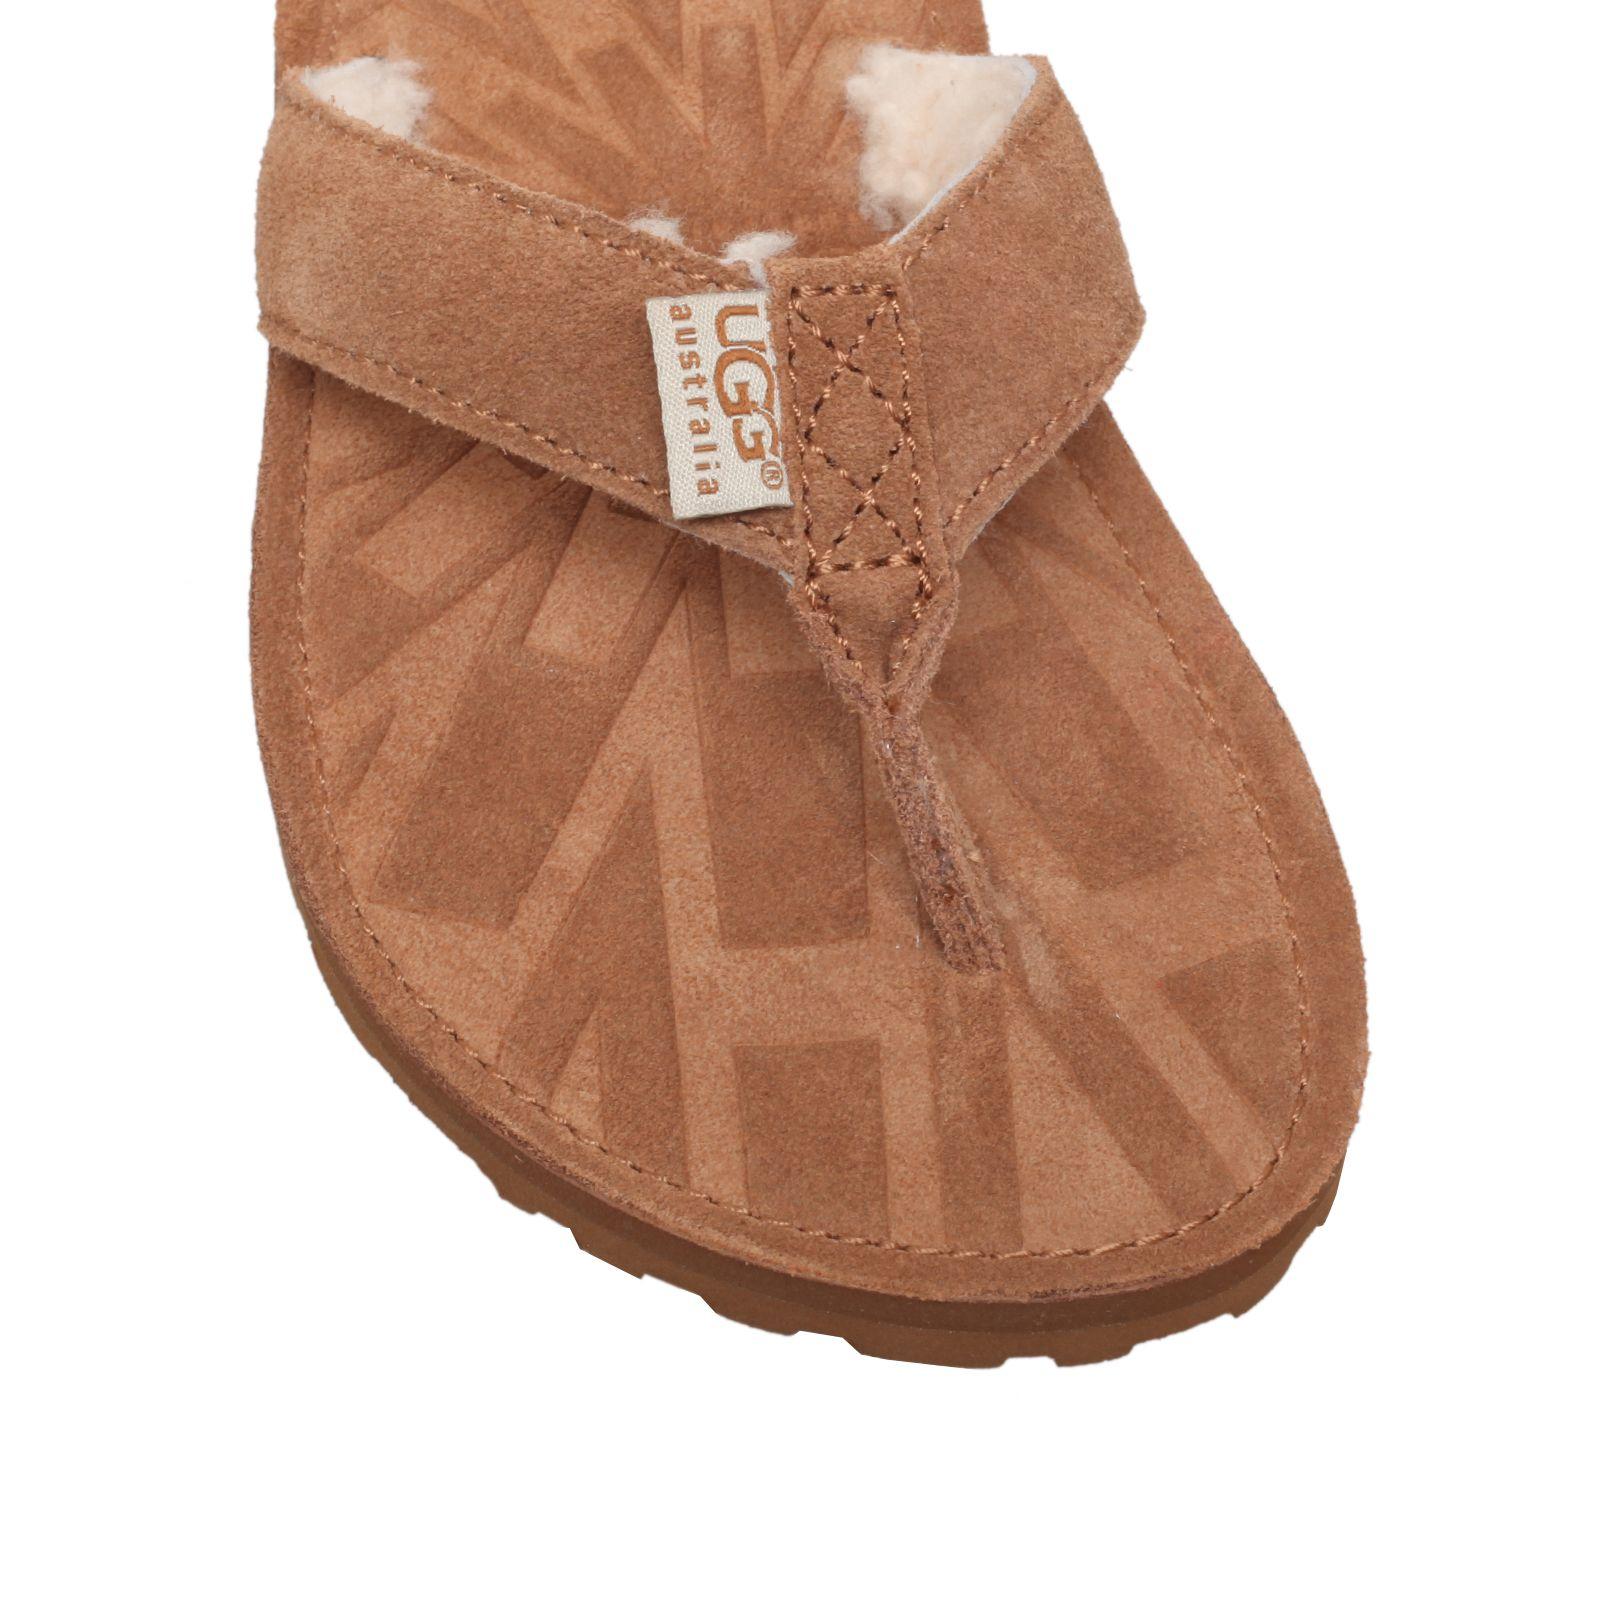 97a16bacb6fd Ugg Tasmina Flat Toe Post Sandals